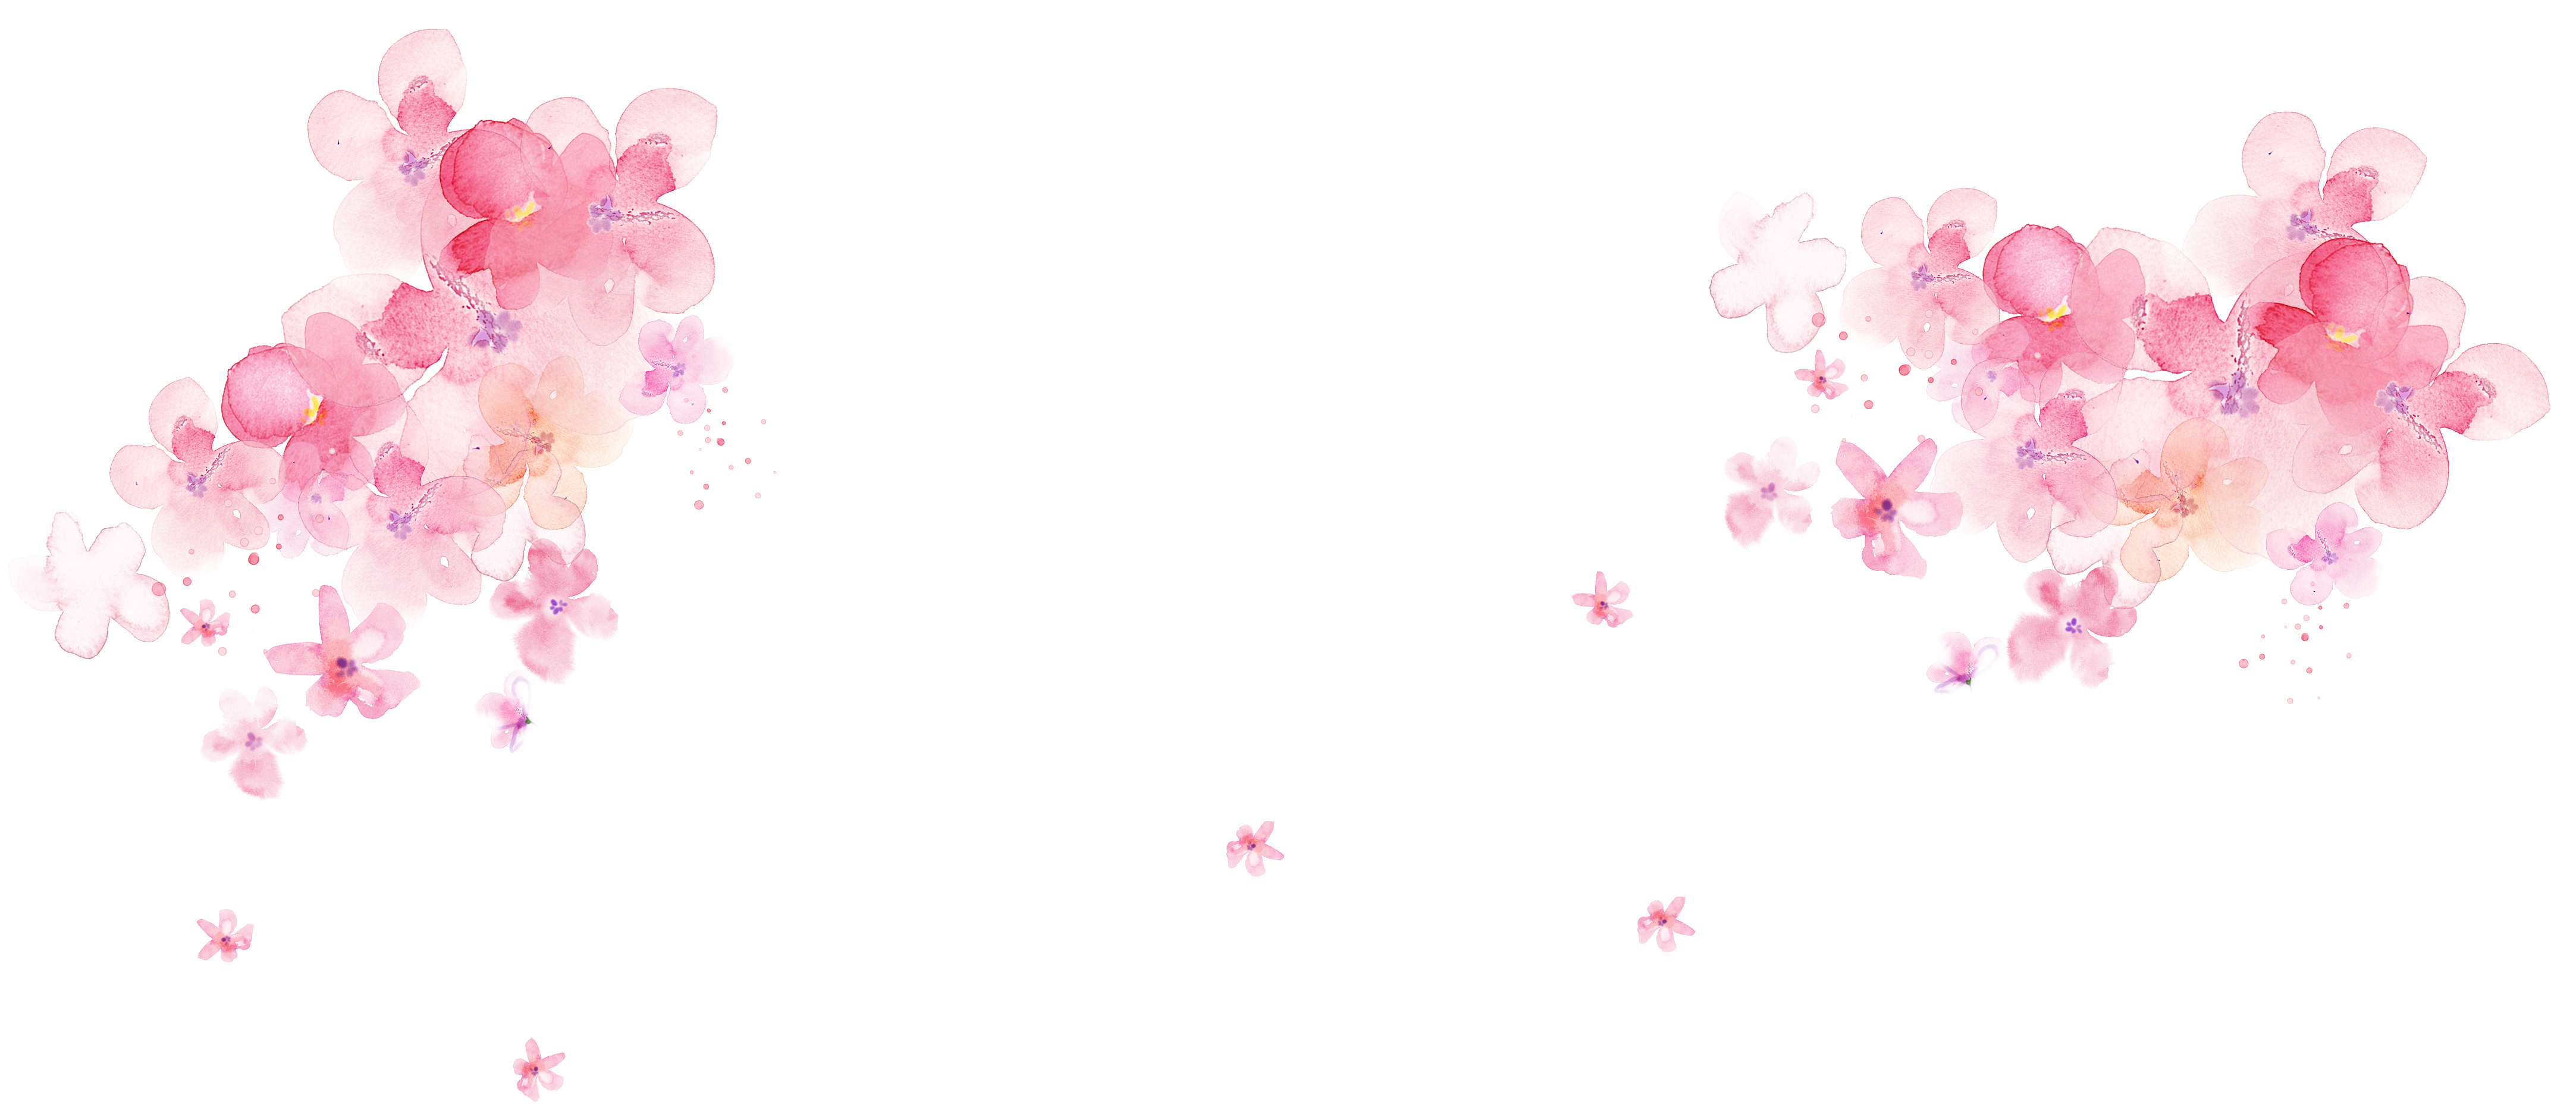 Download Pink Painting Flower Desktop Wallpaper Flowers Transprent